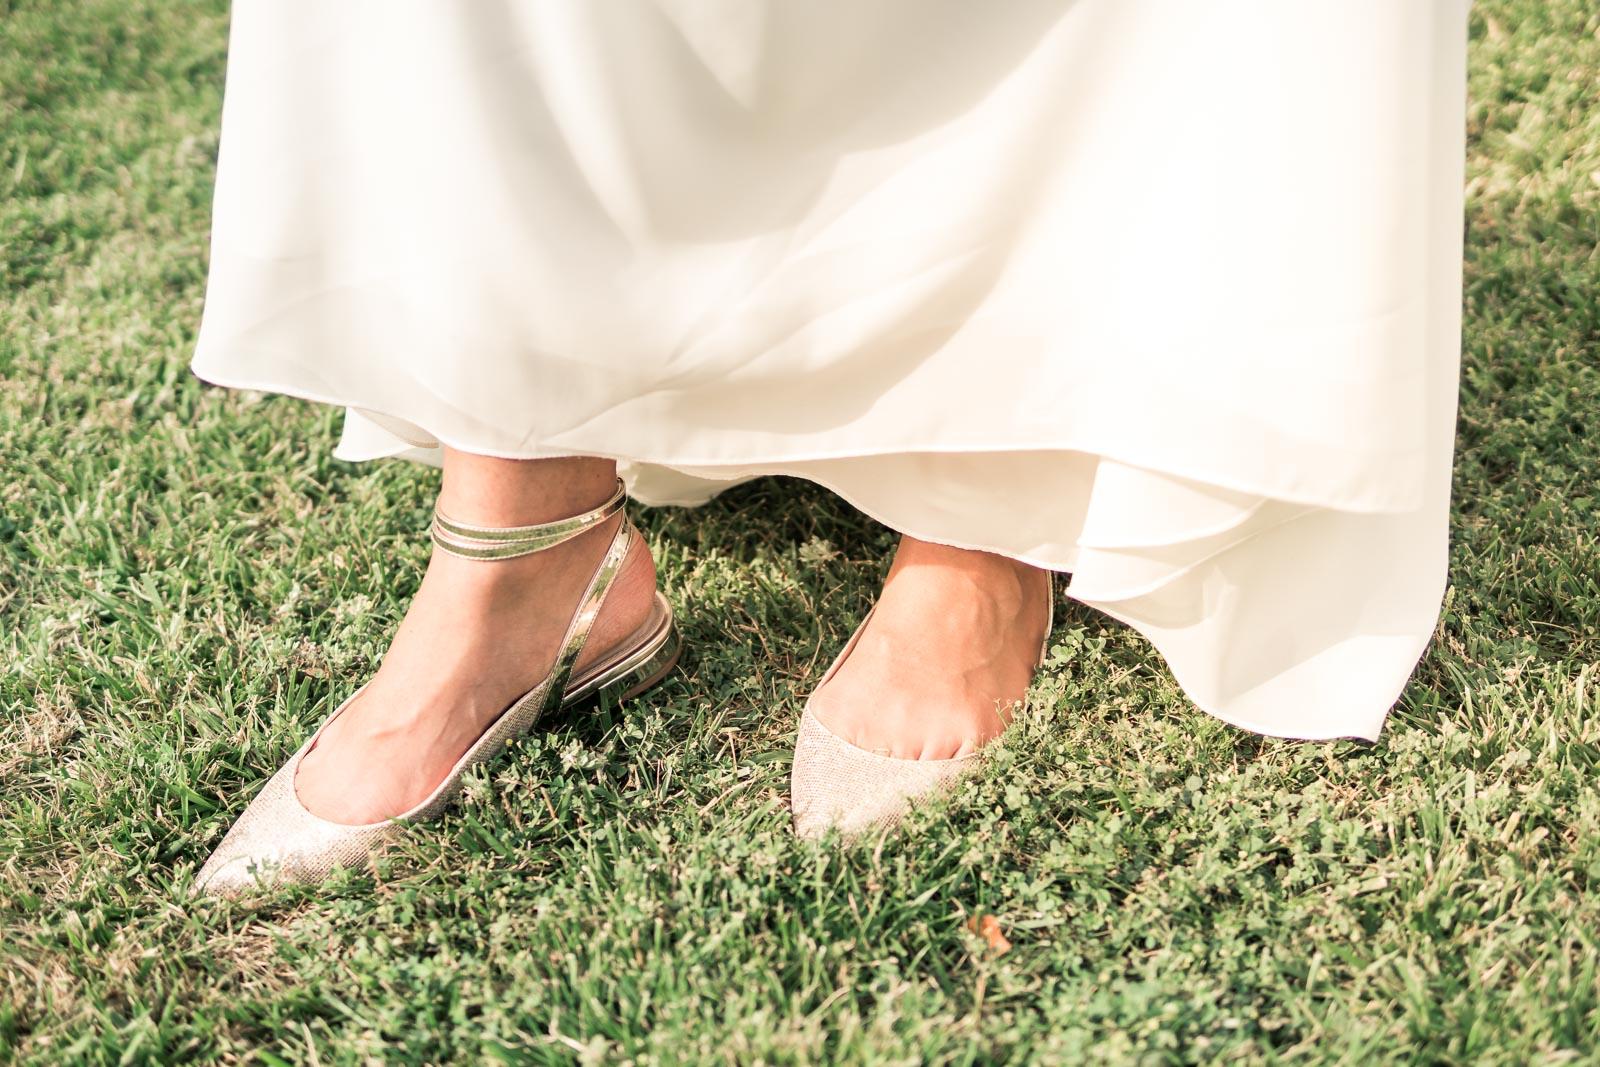 85_Angel-Brea-Orange-County_Joseph-Barber-Wedding-Photography.jpg